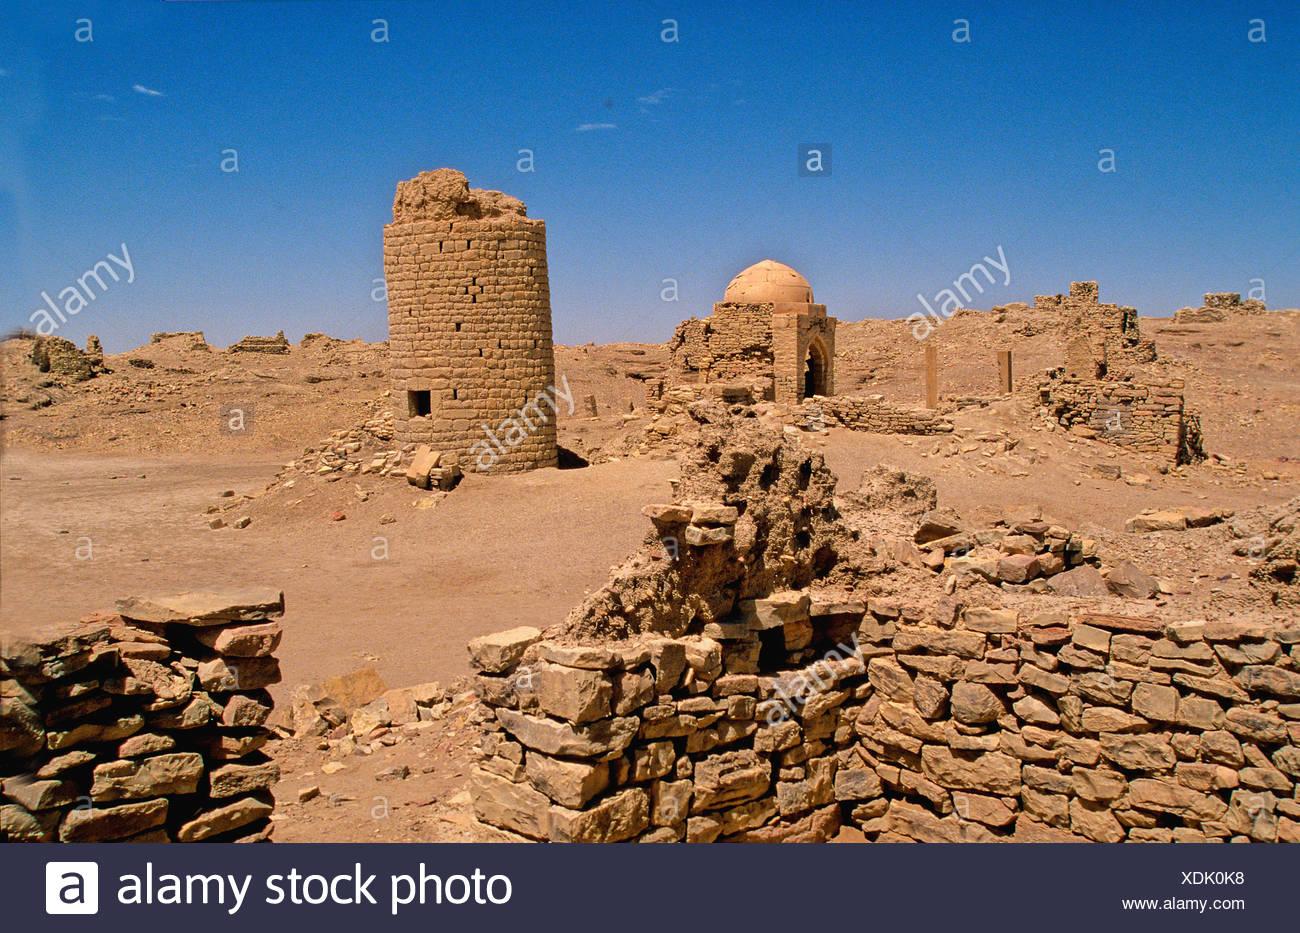 archaeological Site 500-150 Before Christ temple Nacra God Barakish North-east Yemen Arabia Orient - Stock Image